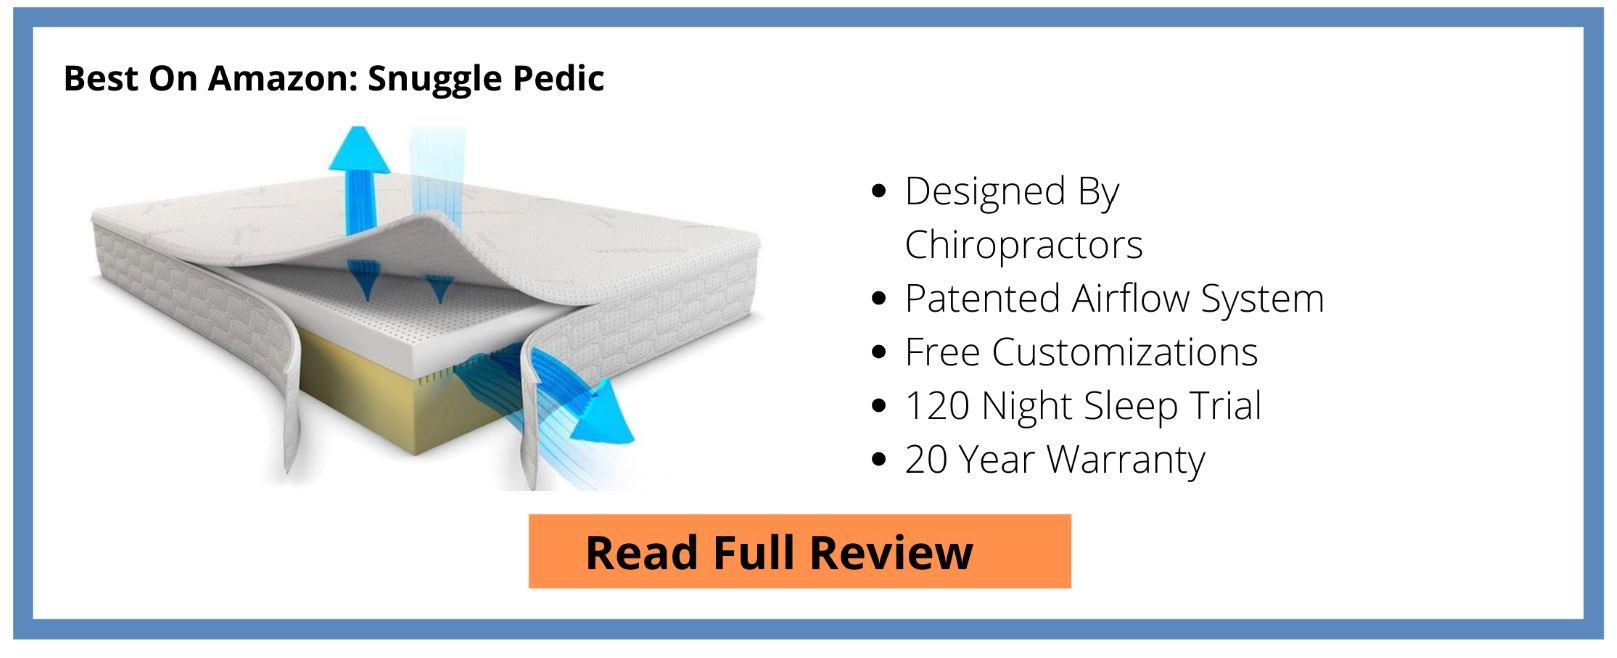 Snuggle Pedic Review Button